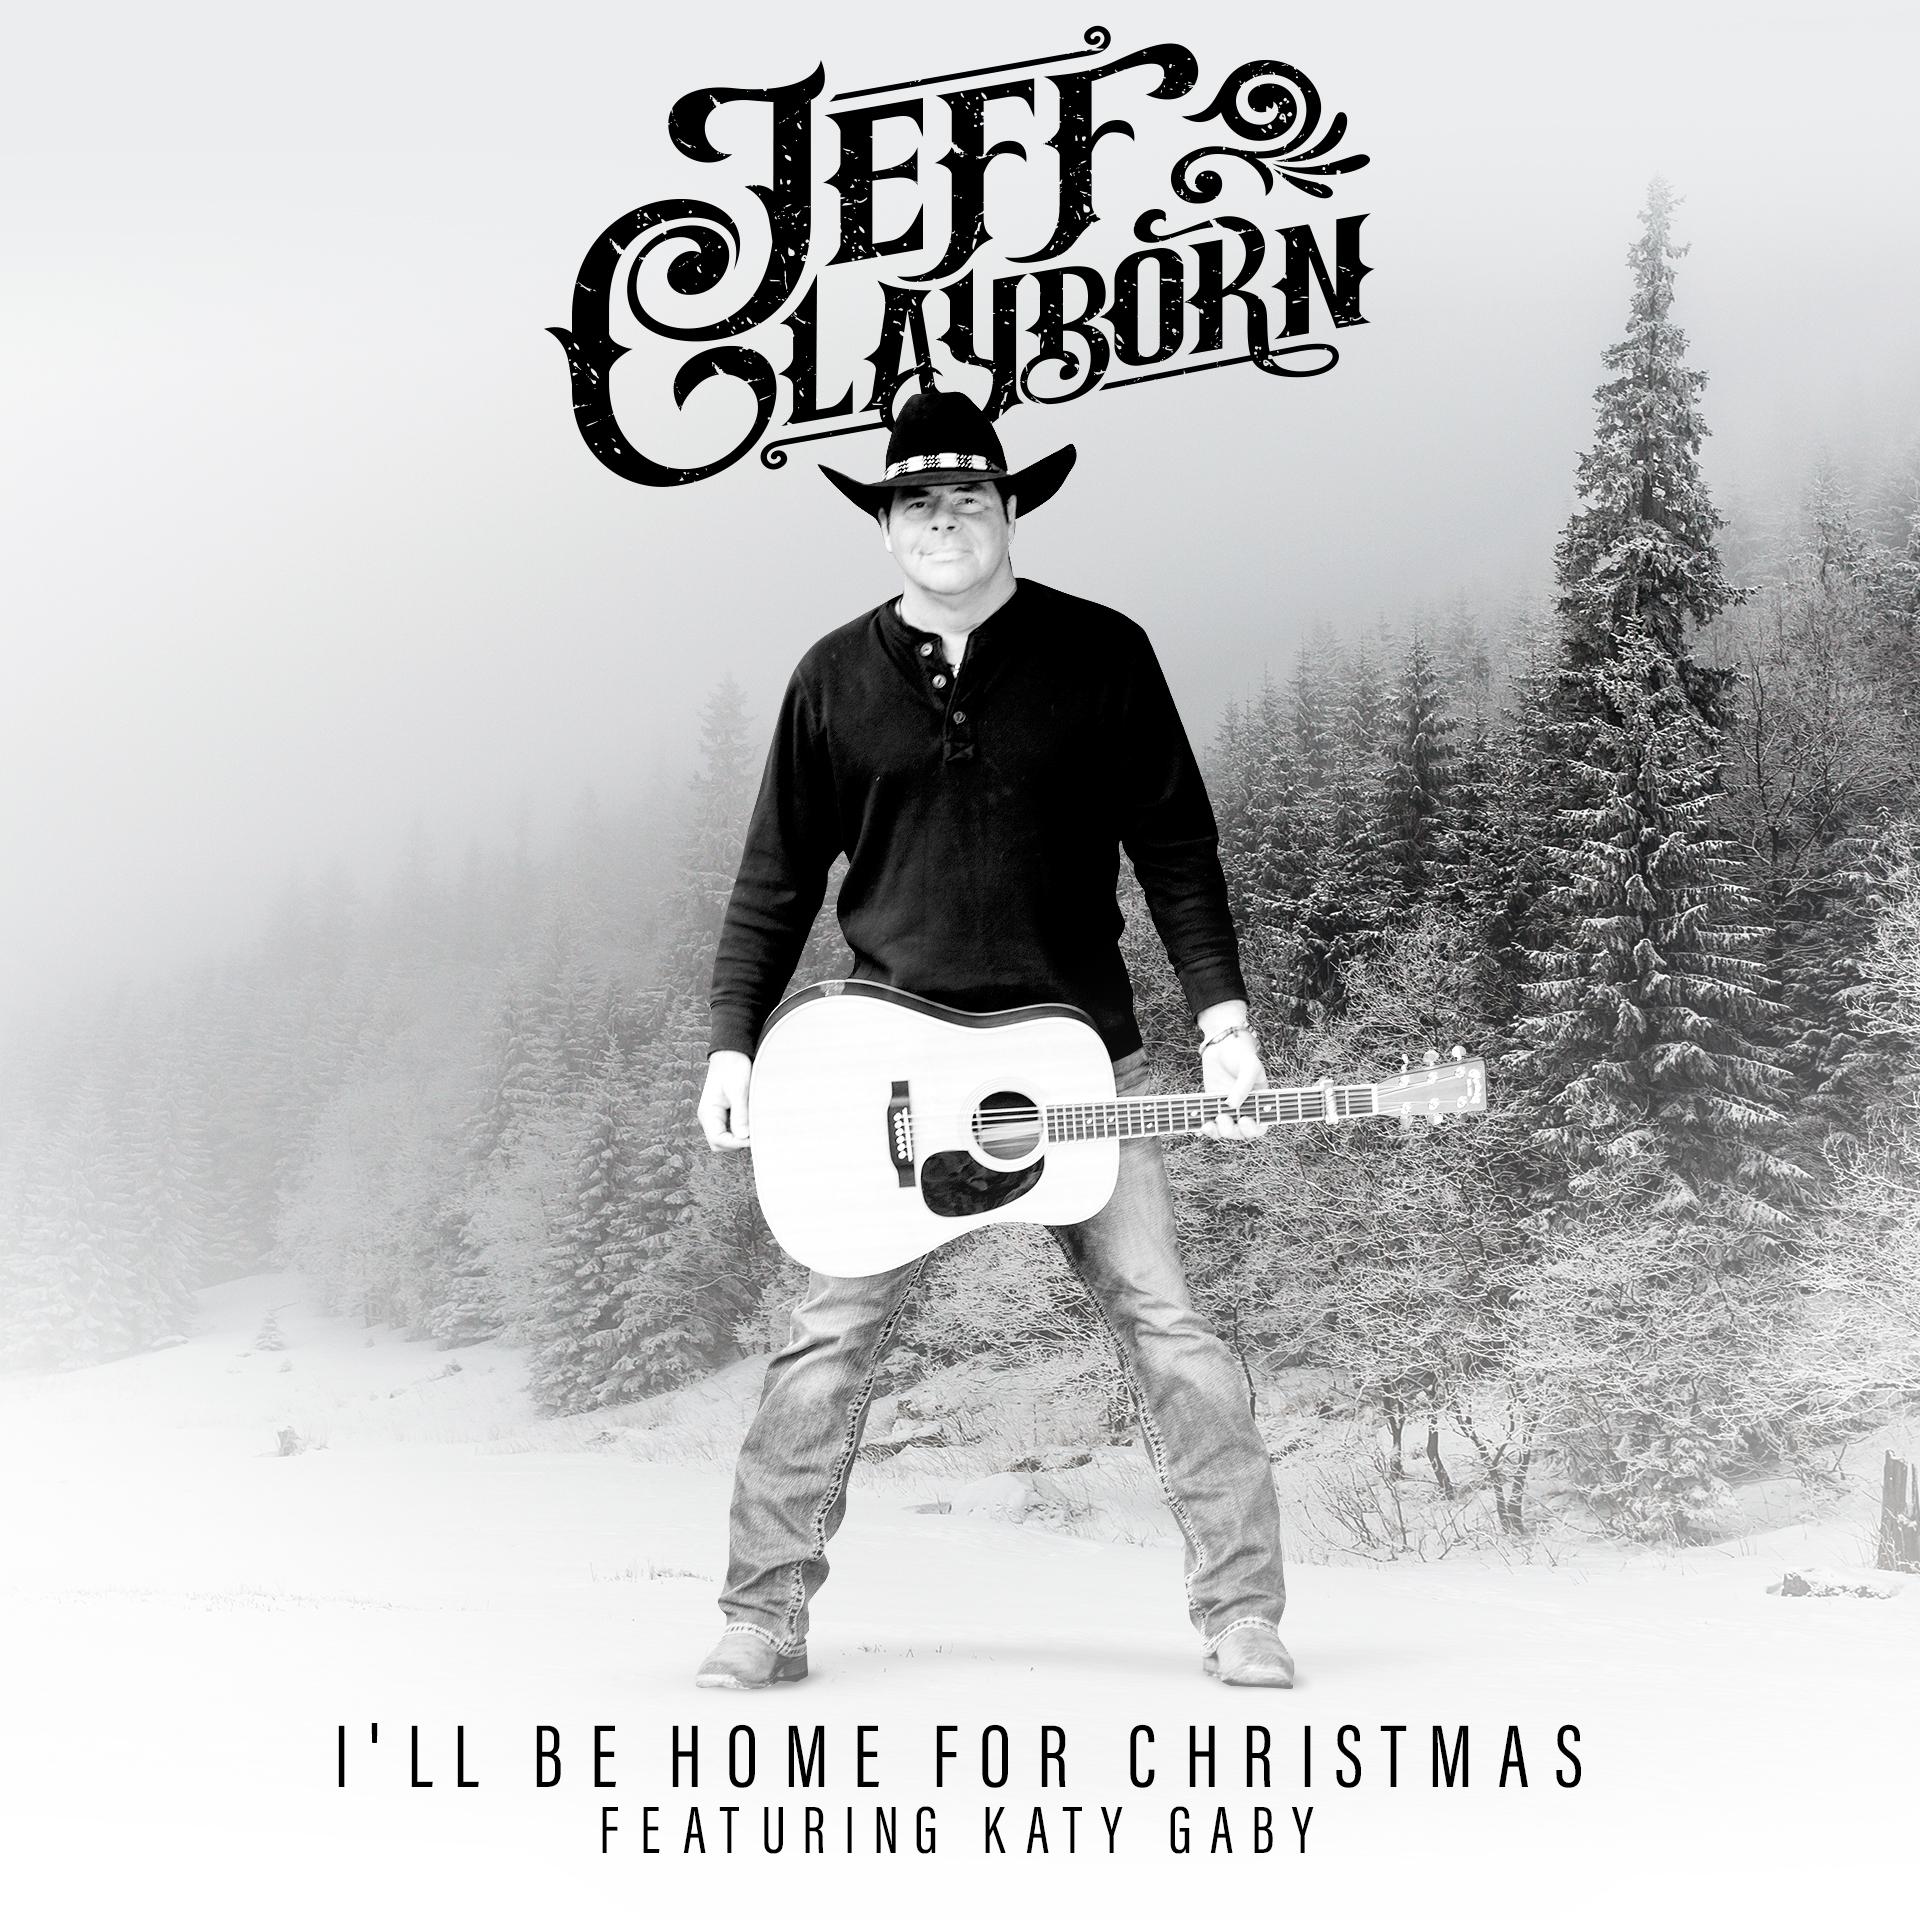 Jeff Clayborn \